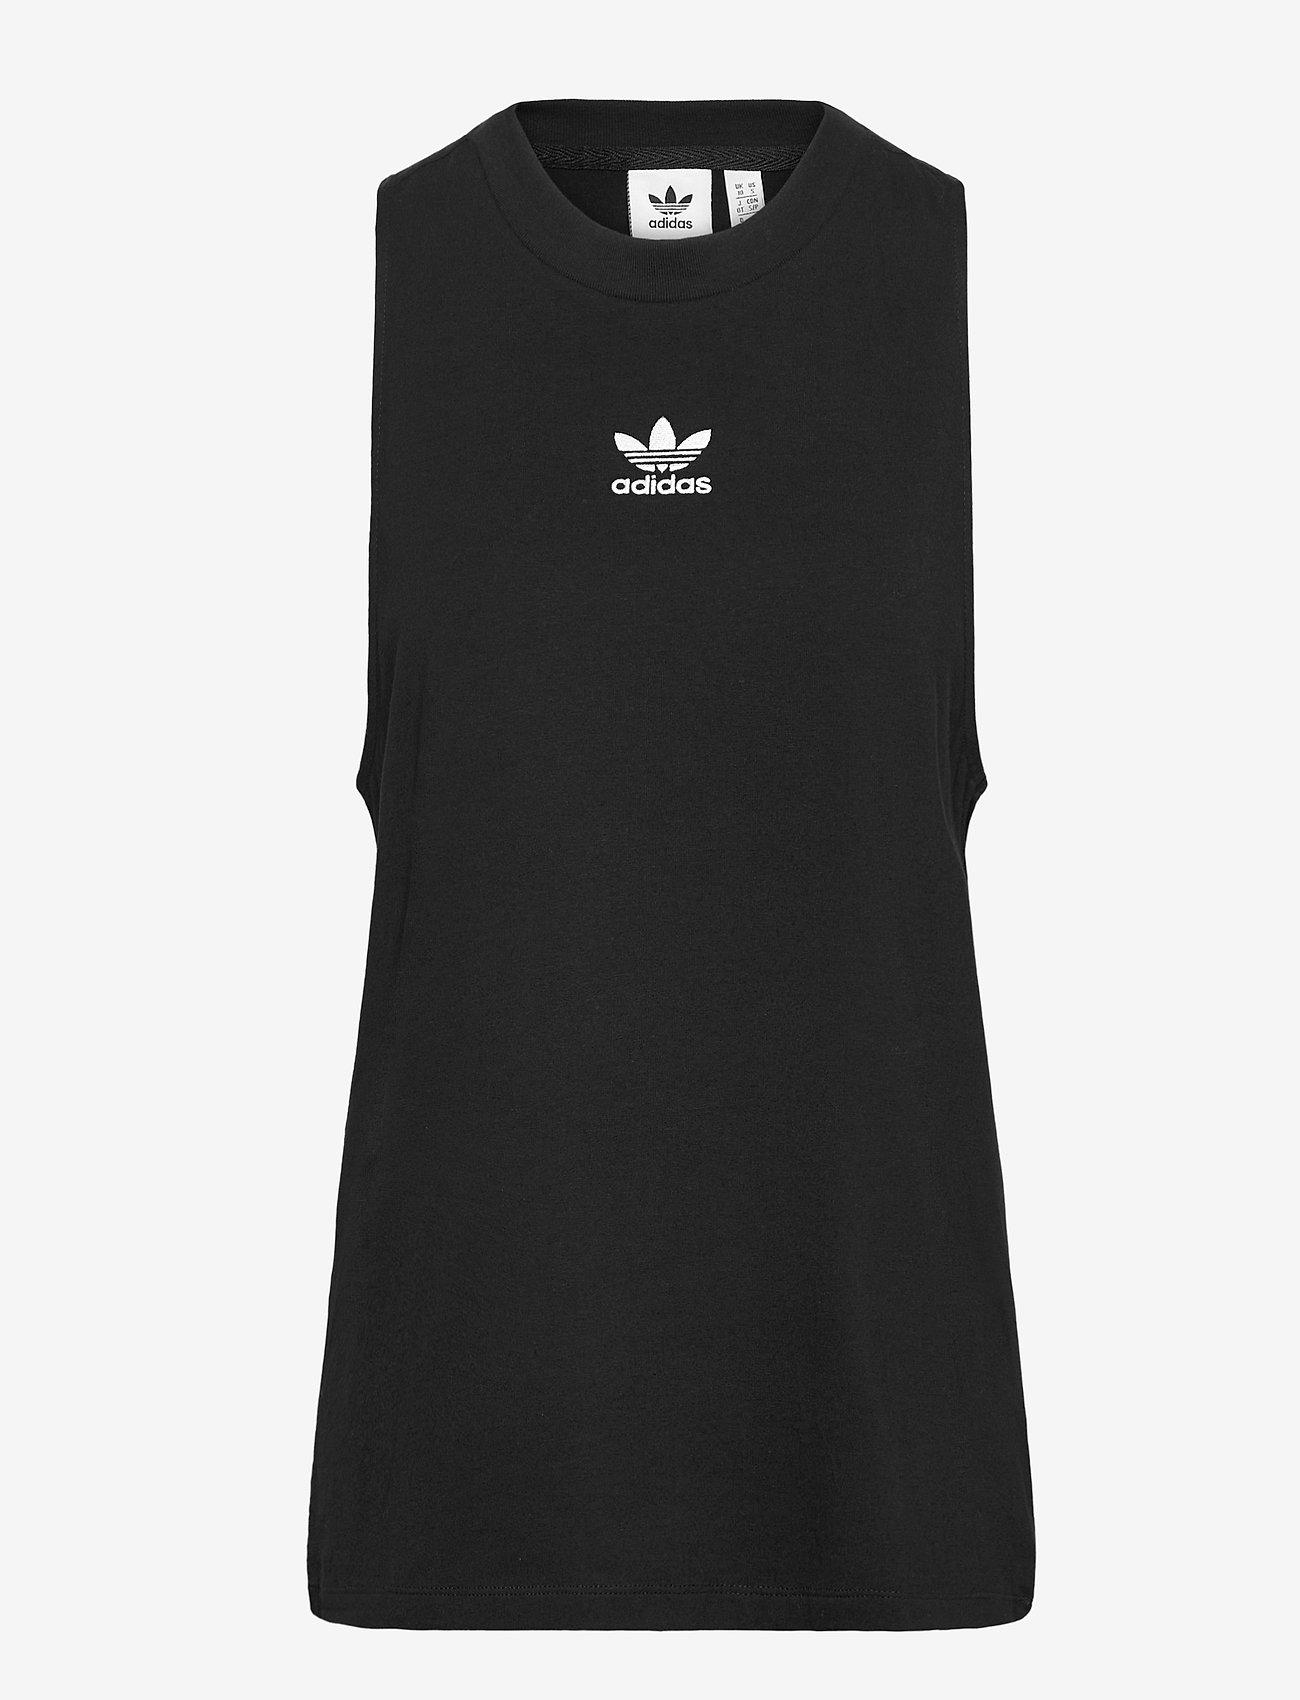 adidas Originals - Adicolor Classics Loose Tank Top W - sportieve tops - black - 1